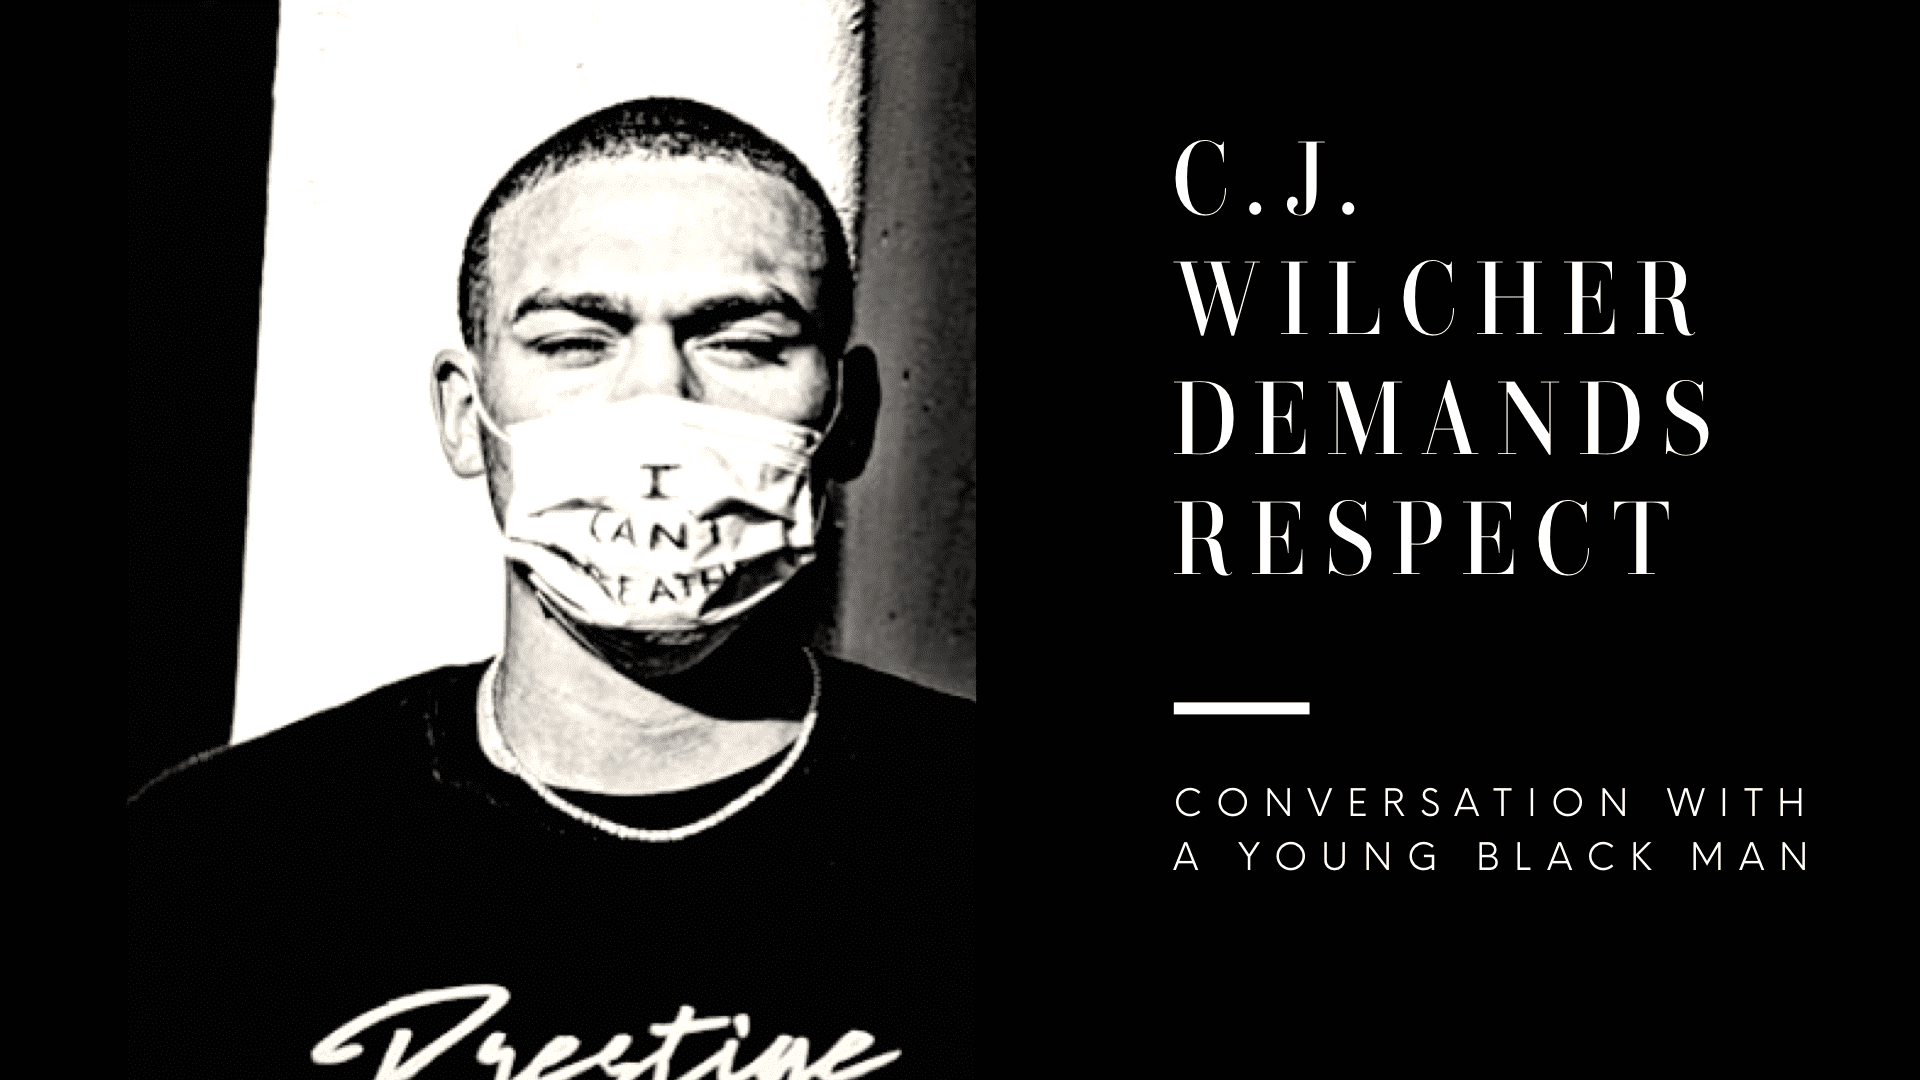 C.J. Wilcher Demands Respect: Conversation with a Young Black Man